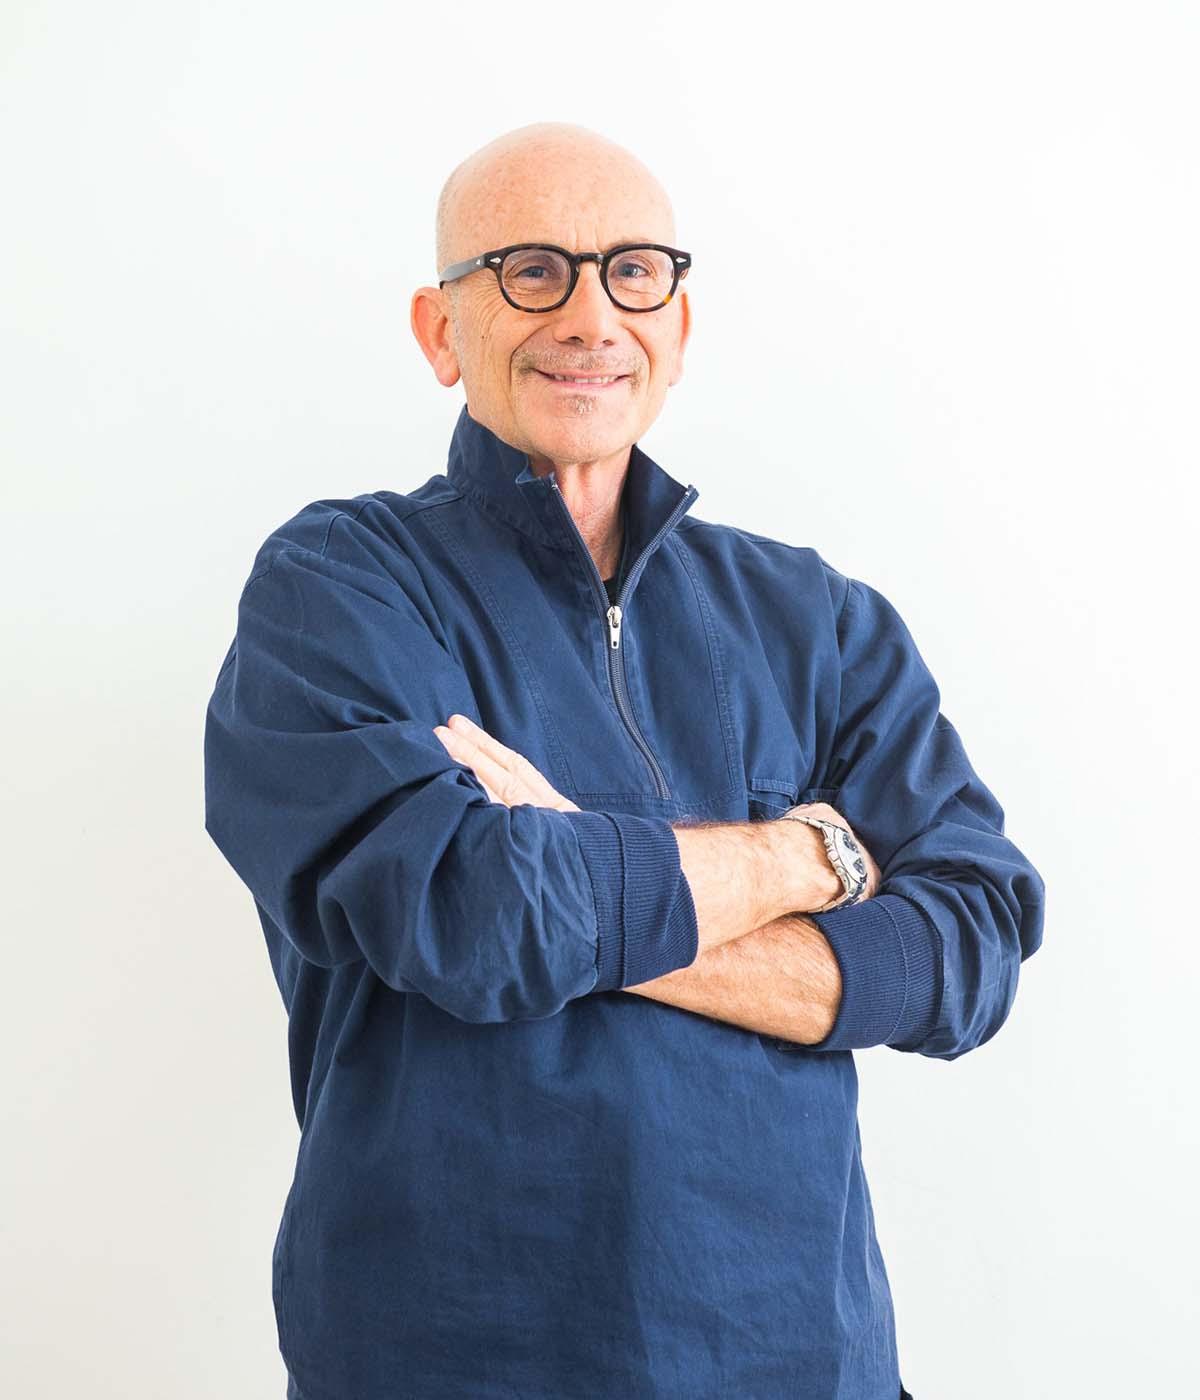 Mauro Laureti chirurgia e implantologia a latina